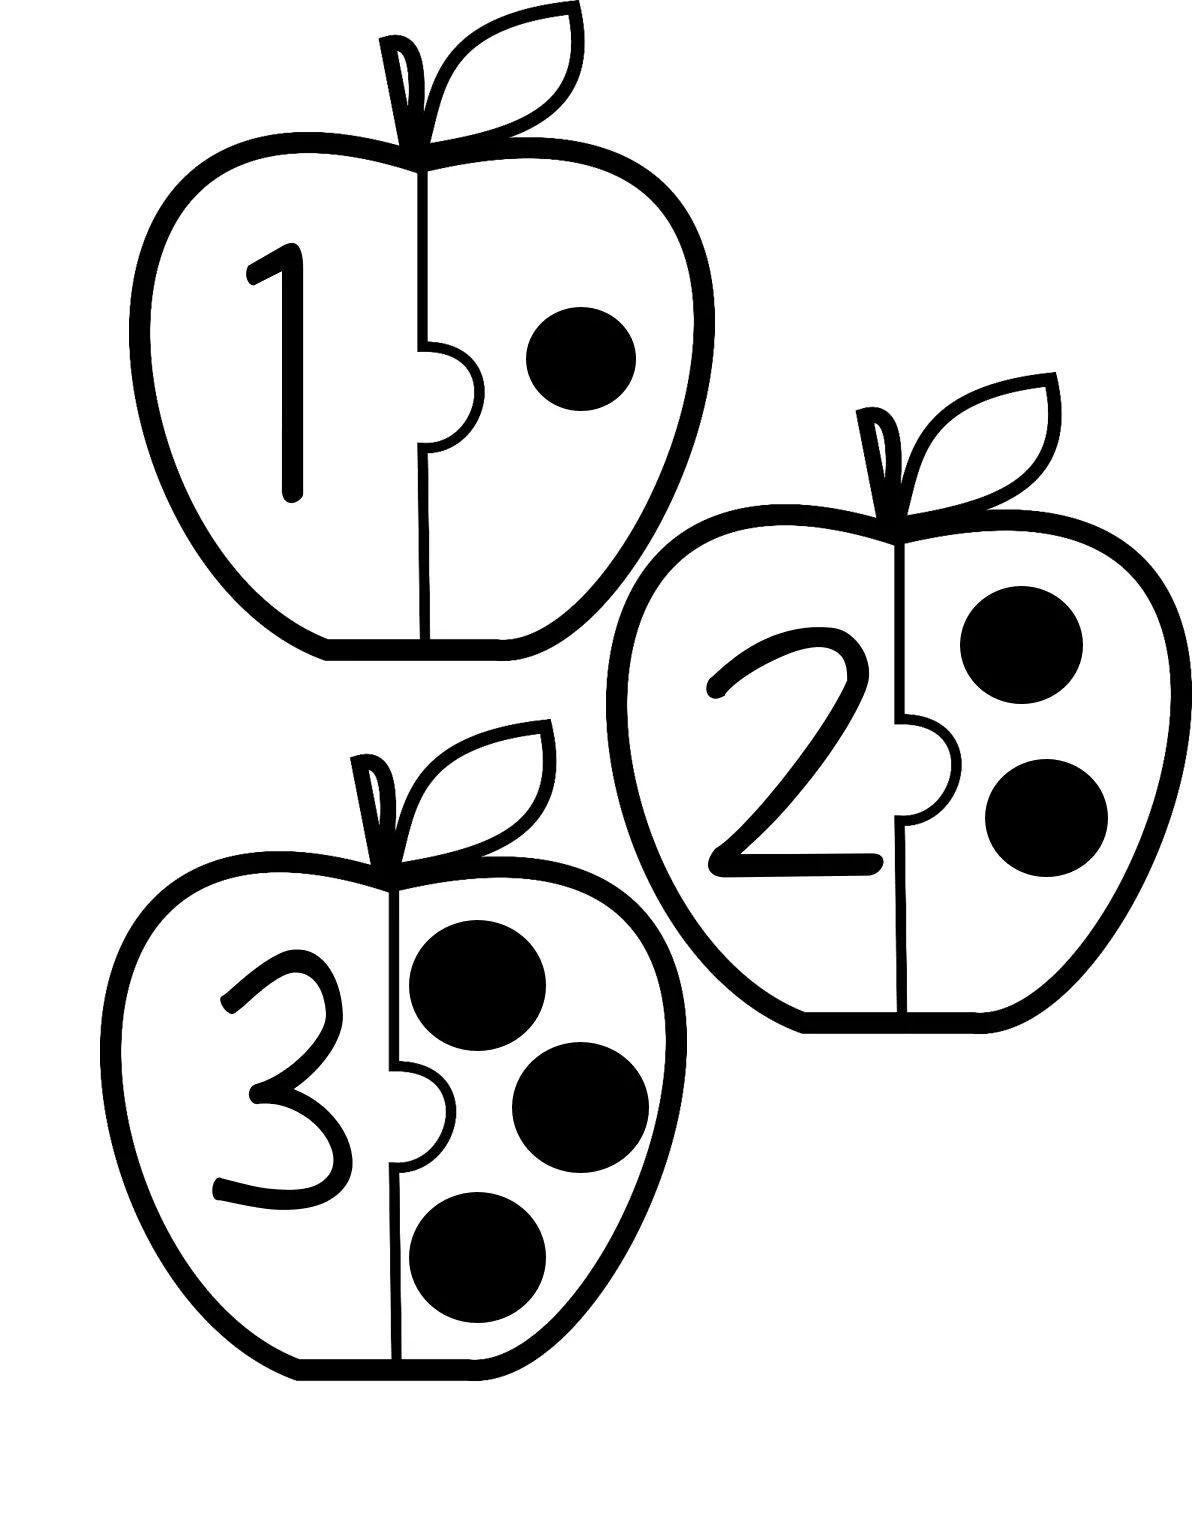 Pin von Wang YunJIUN auf 教具 | Pinterest | Mathe, Legasthenie und ...